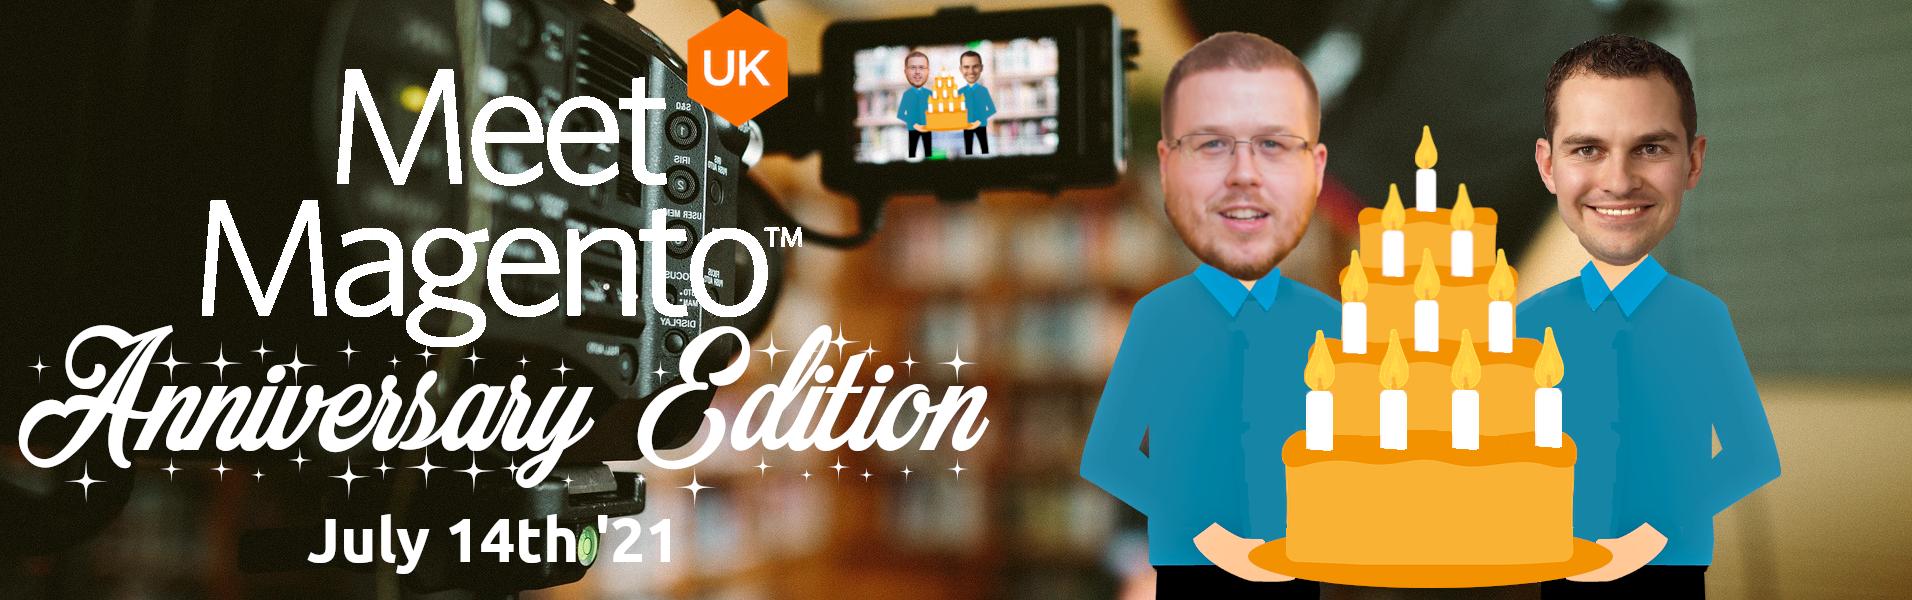 Meet Magento UK '21 - Peter Sheldon and Jamie Huskisson